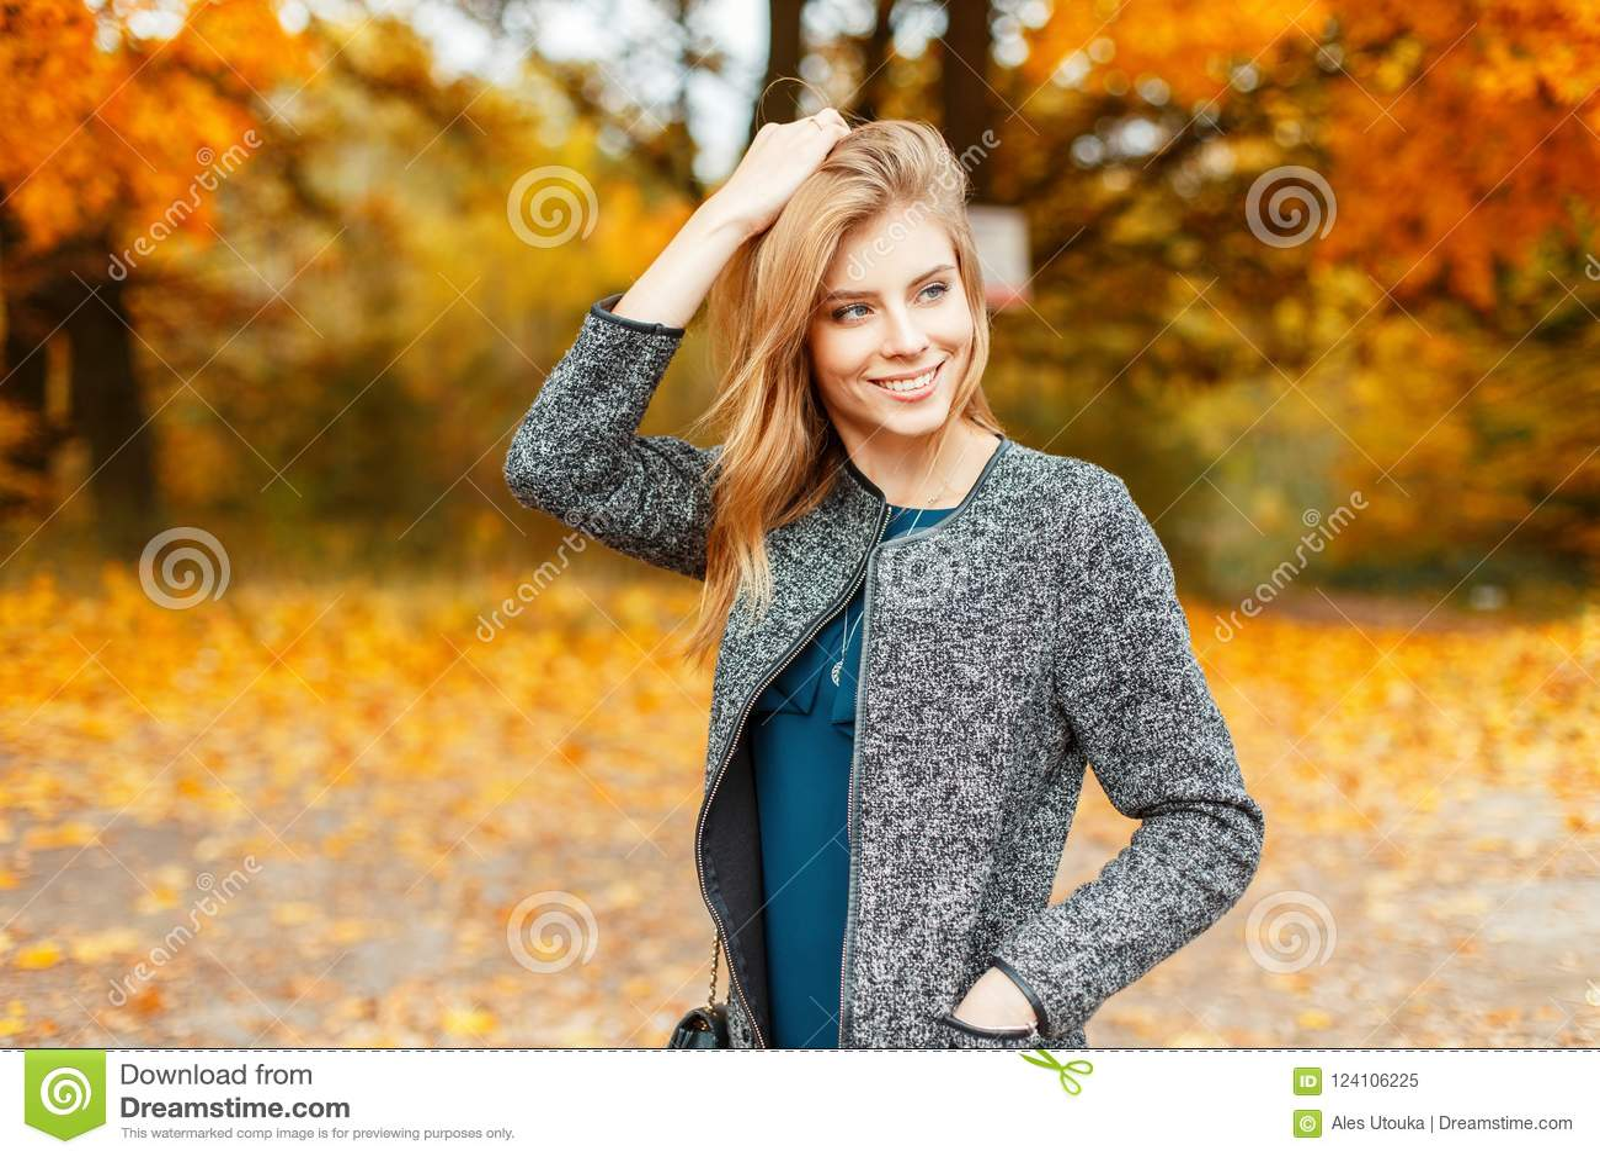 c929455370 Beautiful happy woman in autumn stylish clothes enjoying the weather near  the yellow foliage